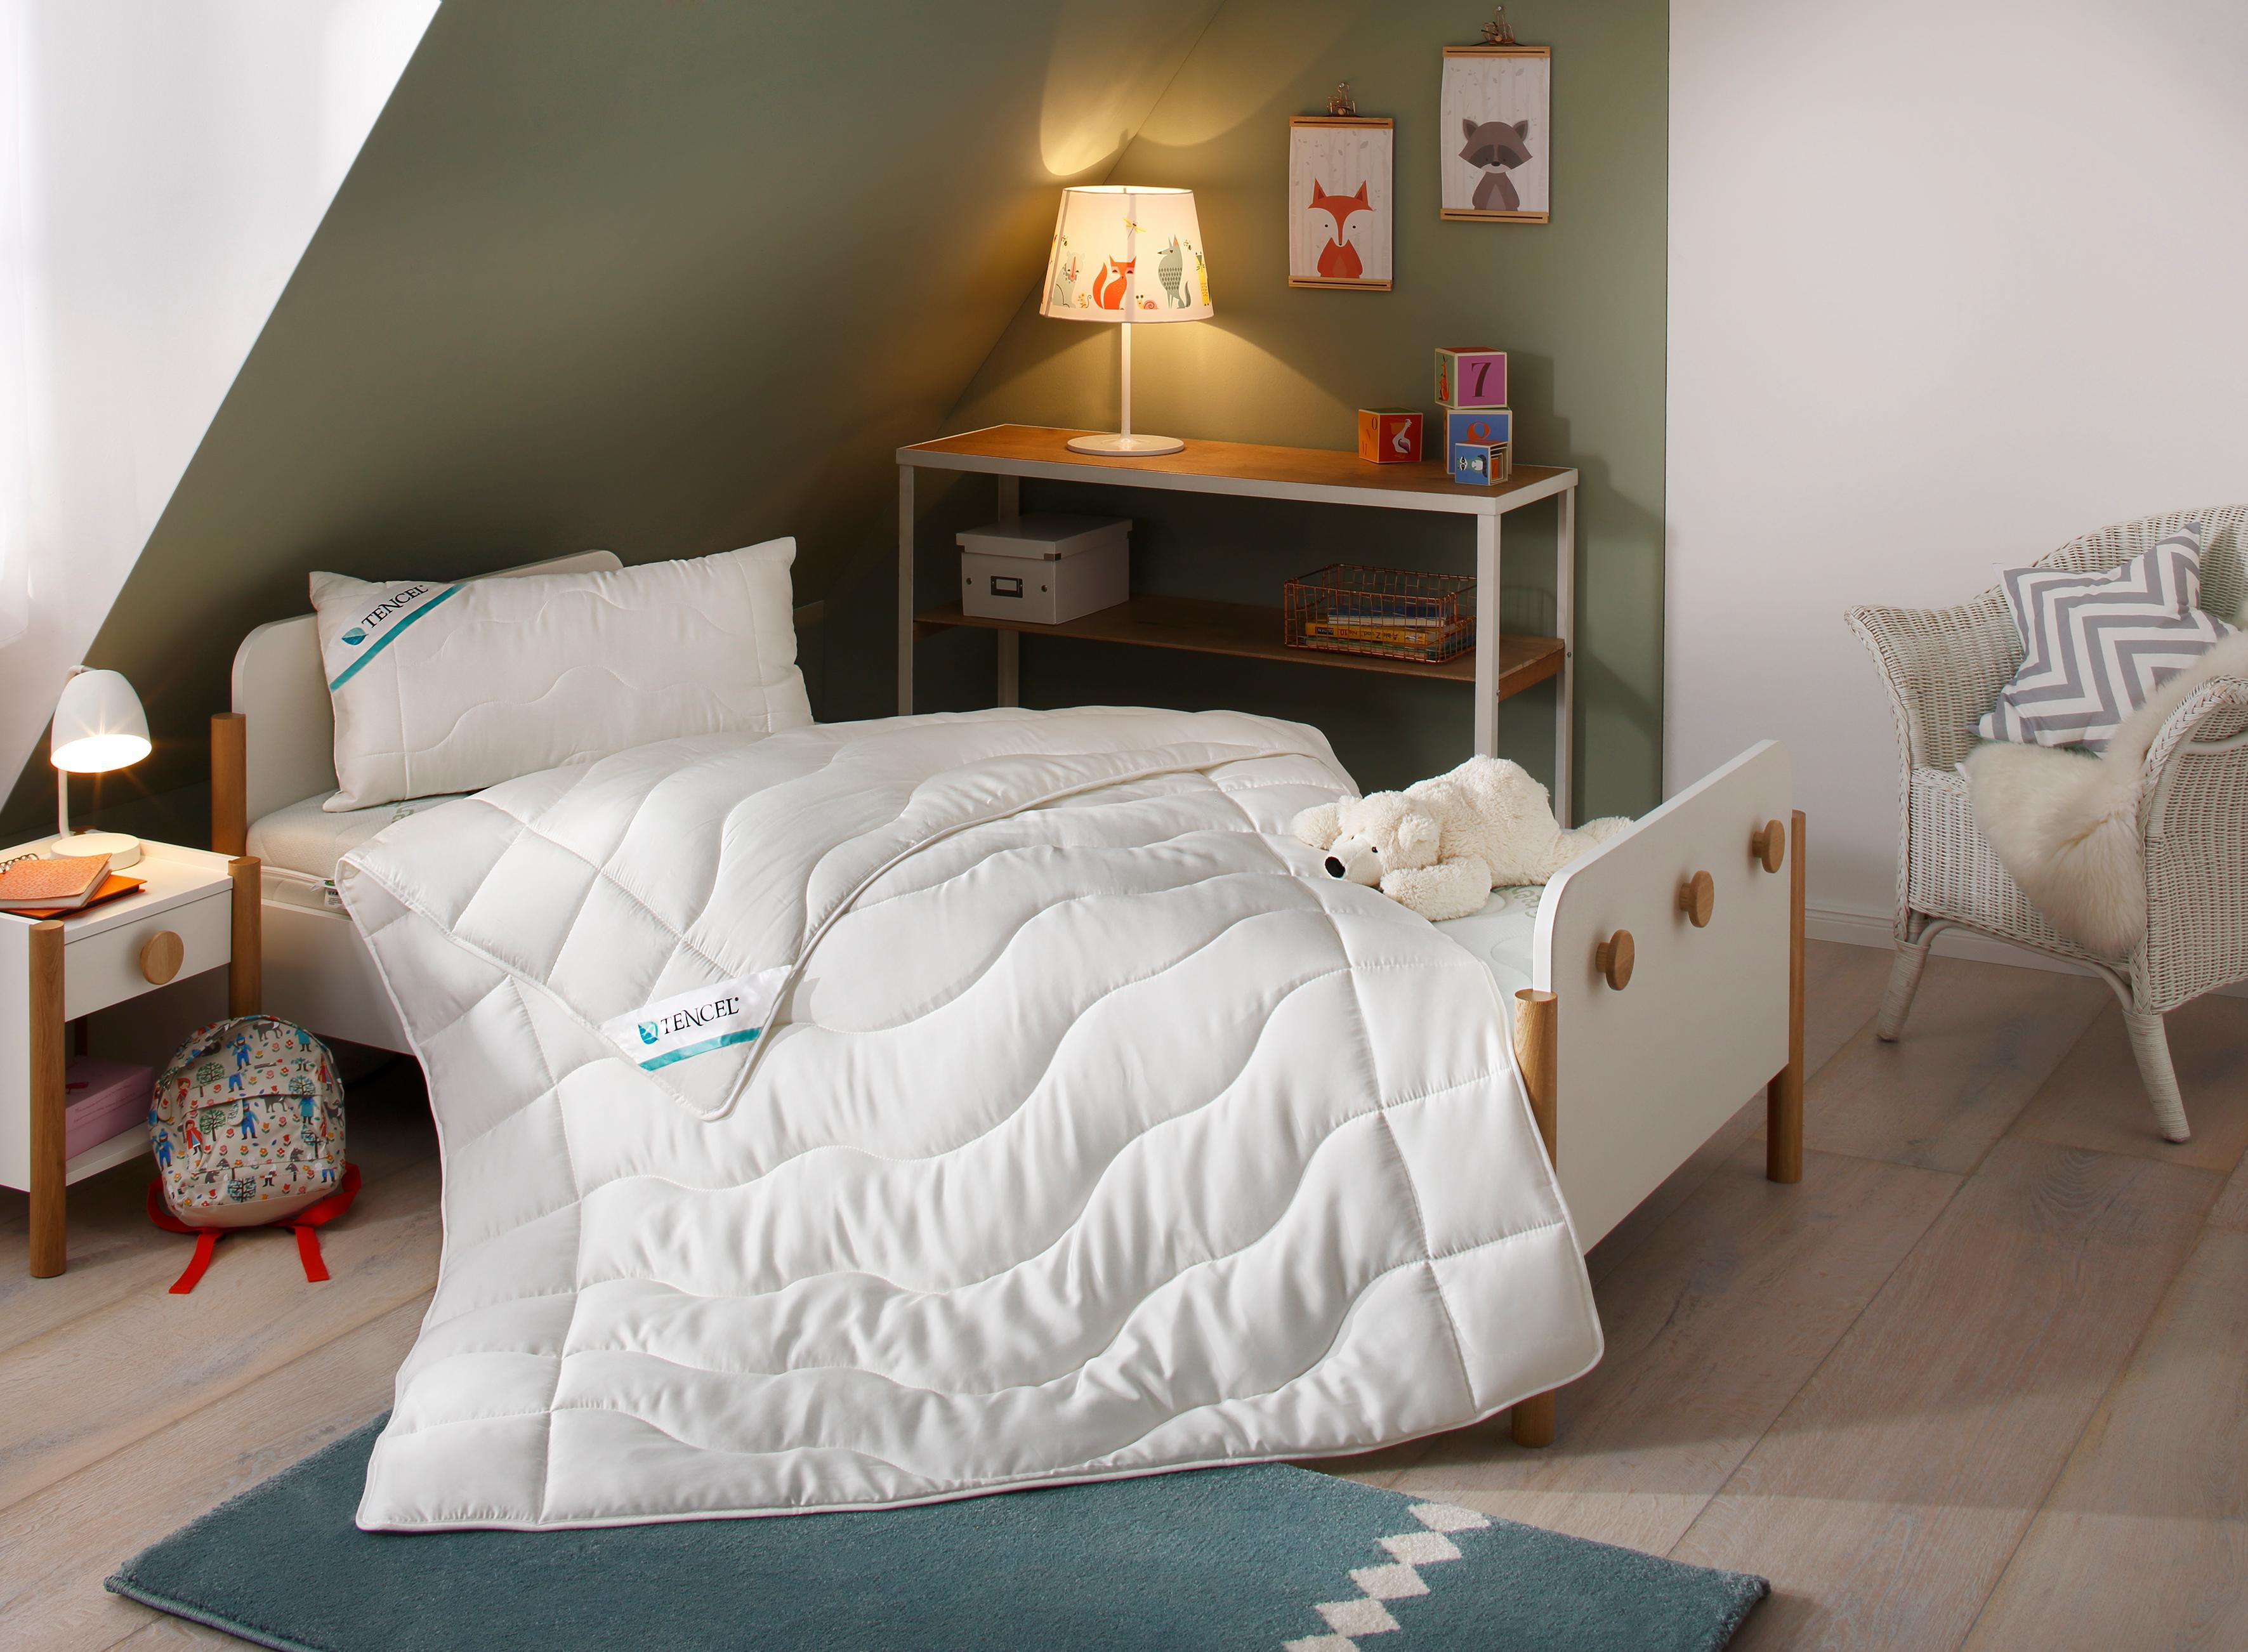 Kinderbettdecke + Kopfkissen TENCEL Lüttenhütt normal Füllung: 80% Lyocell (TENCEL) 20% Polyester Bezug: 100% Lyocell (TENCEL)